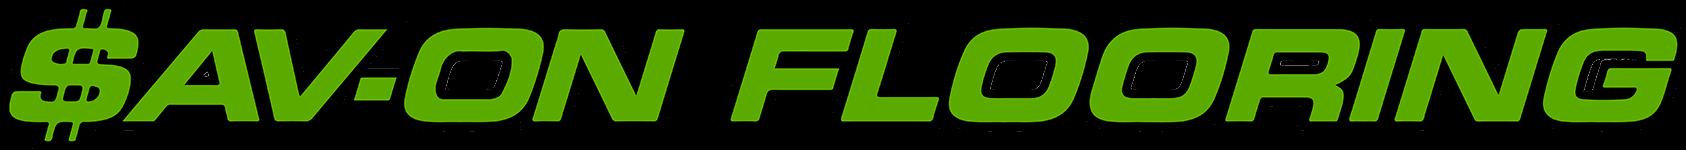 Sav-On Flooring logo